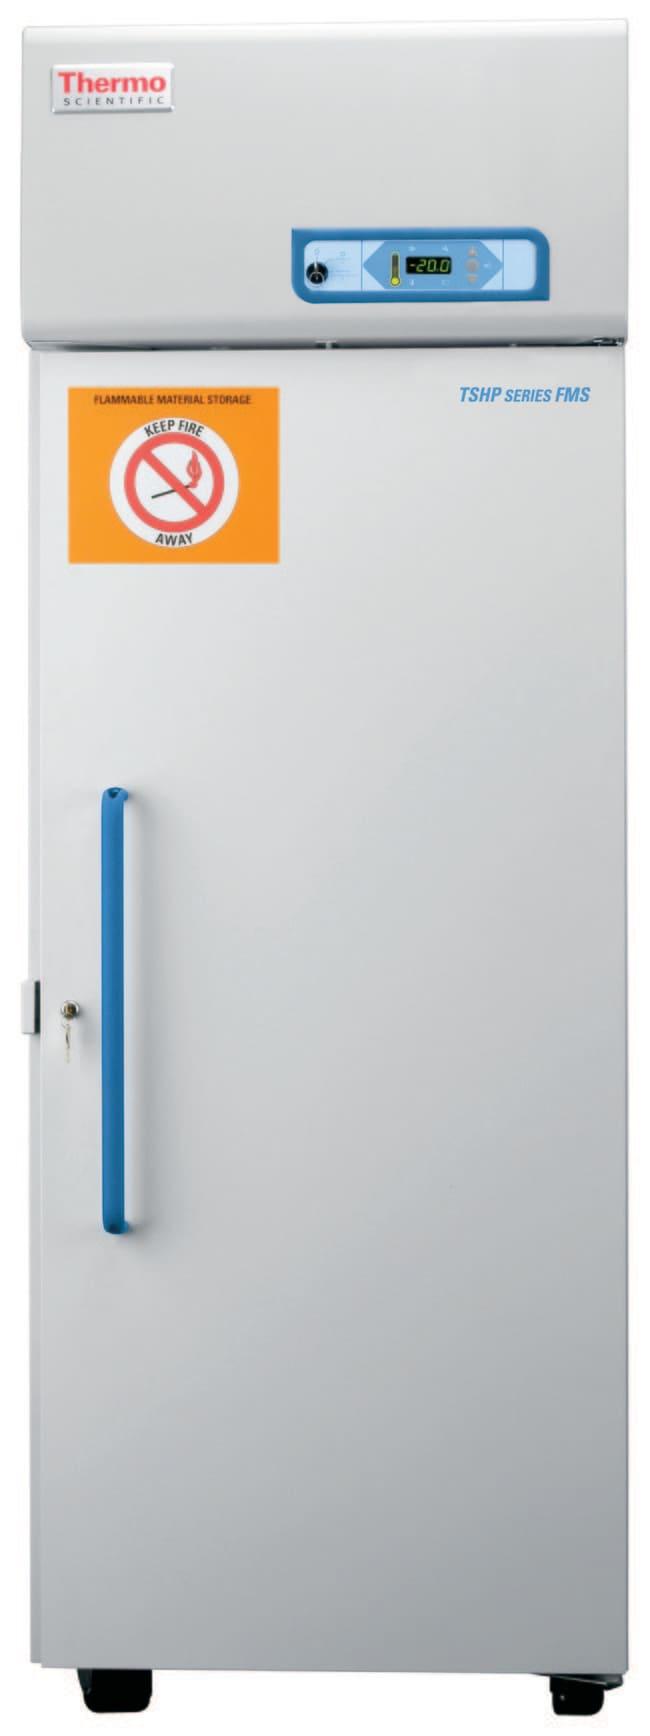 TSHP FMS High-Performance Laboratory Freezer, -20°C; 23 cu. ft., 115V